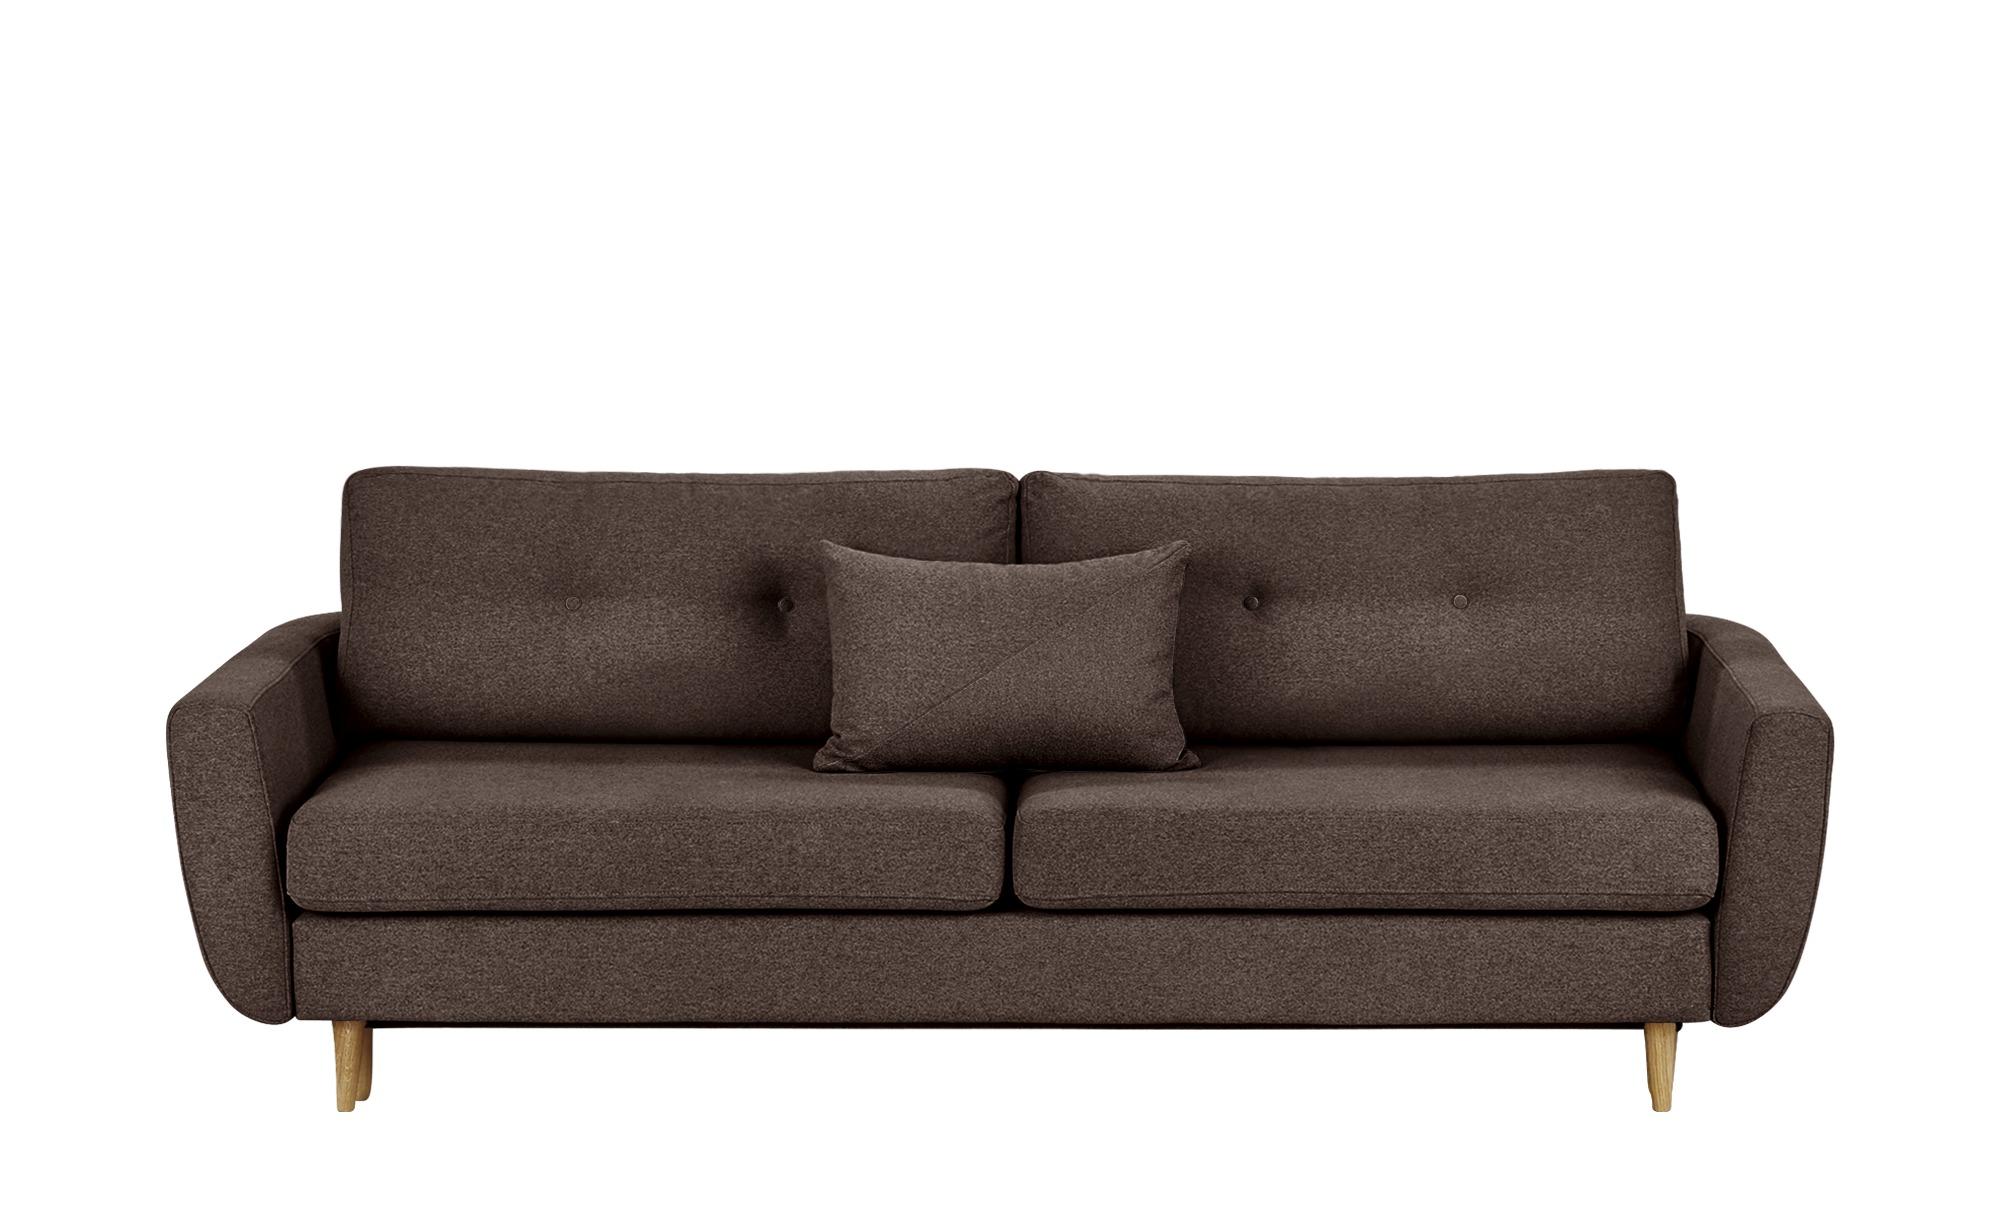 sofas online kaufen erfahrungen bruin blog. Black Bedroom Furniture Sets. Home Design Ideas